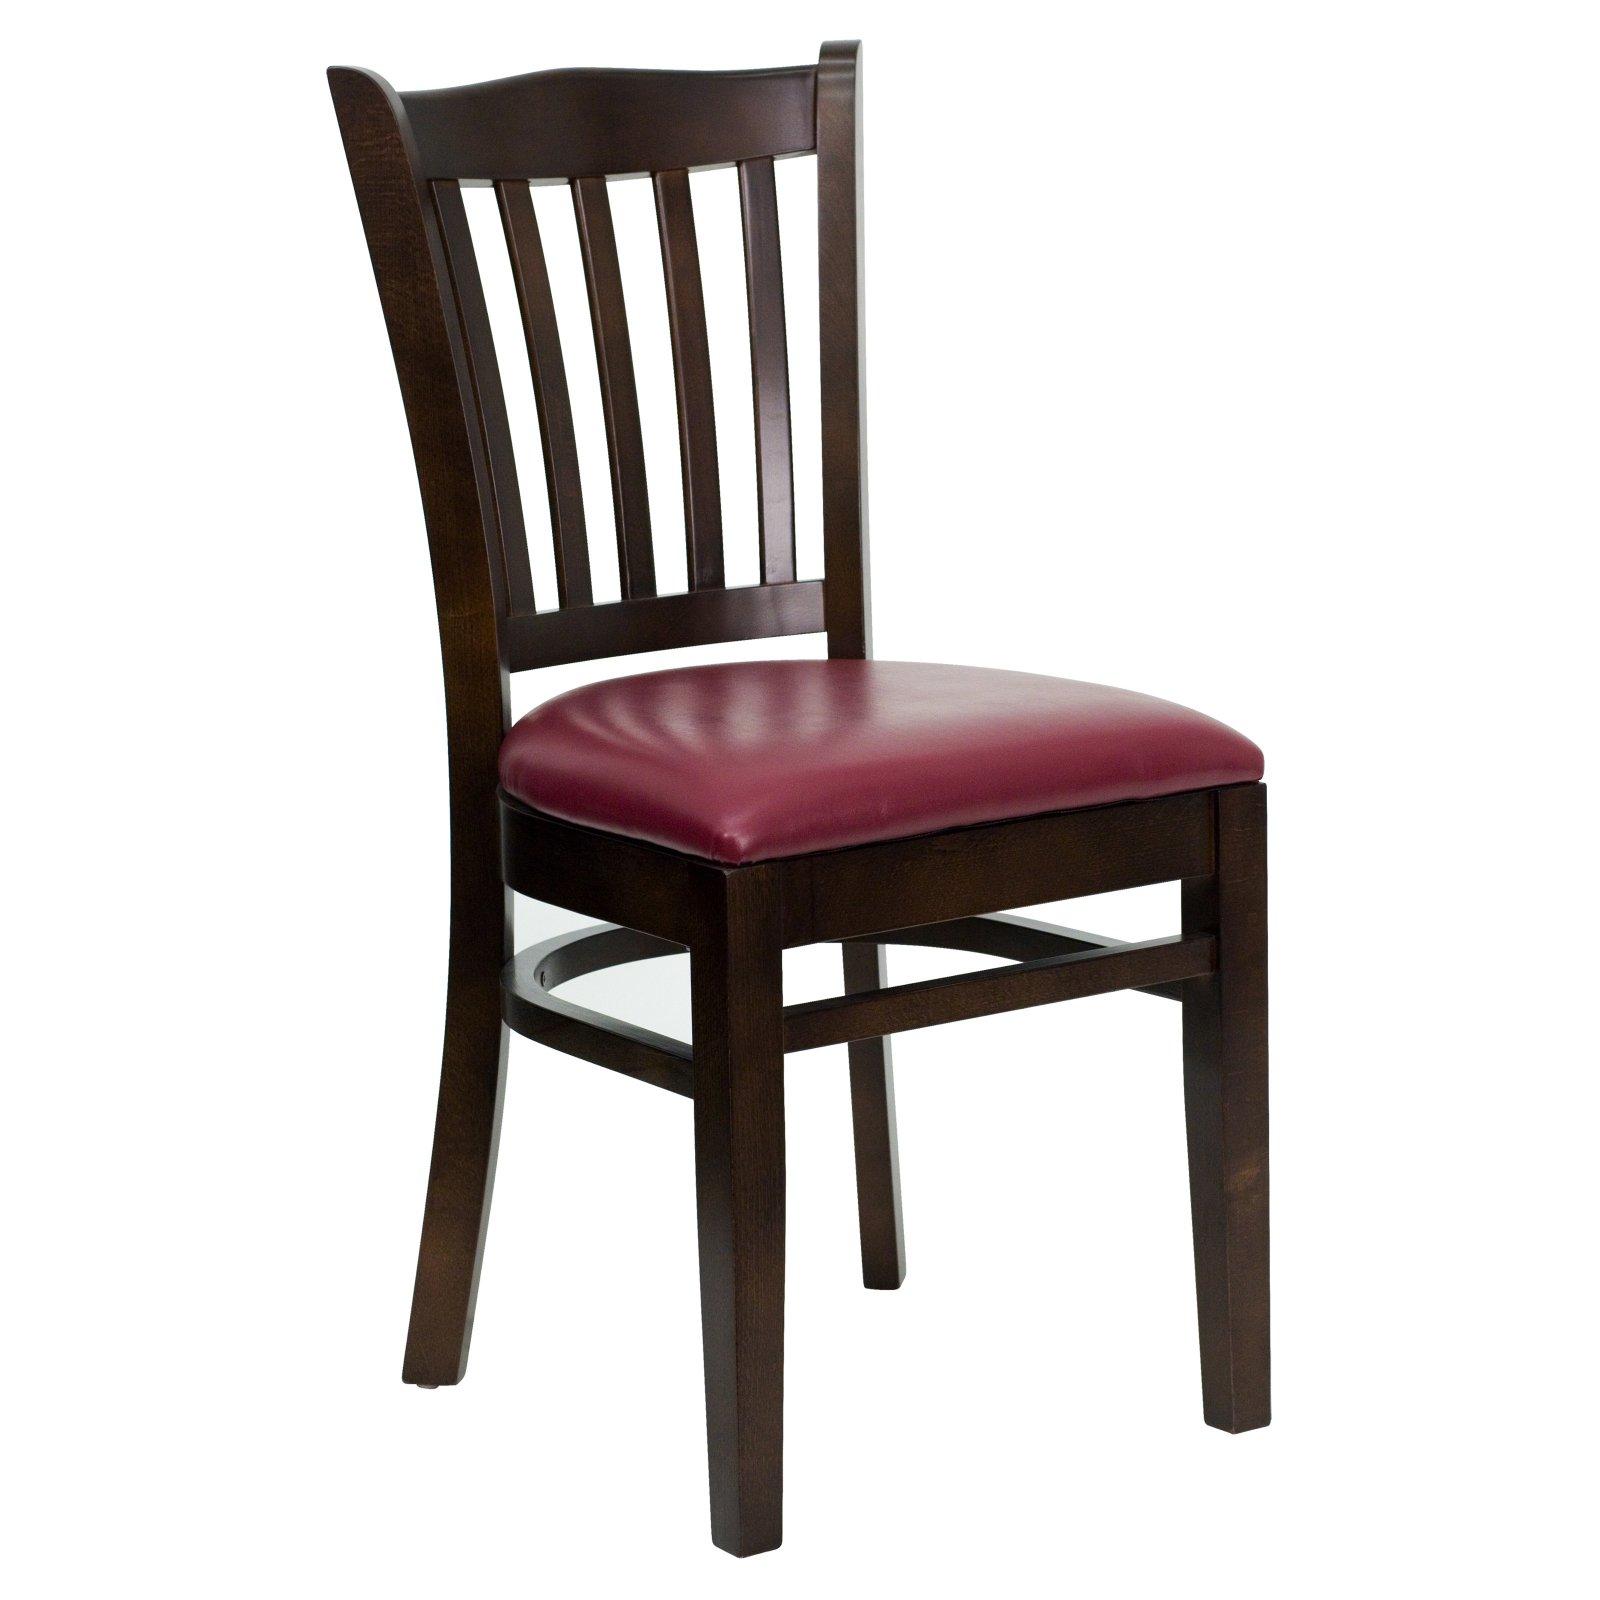 Flash Furniture HERCULES Series Walnut Finished Vertical Slat Back Wooden Restaurant Chair, Vinyl Seat, Multiple Colors